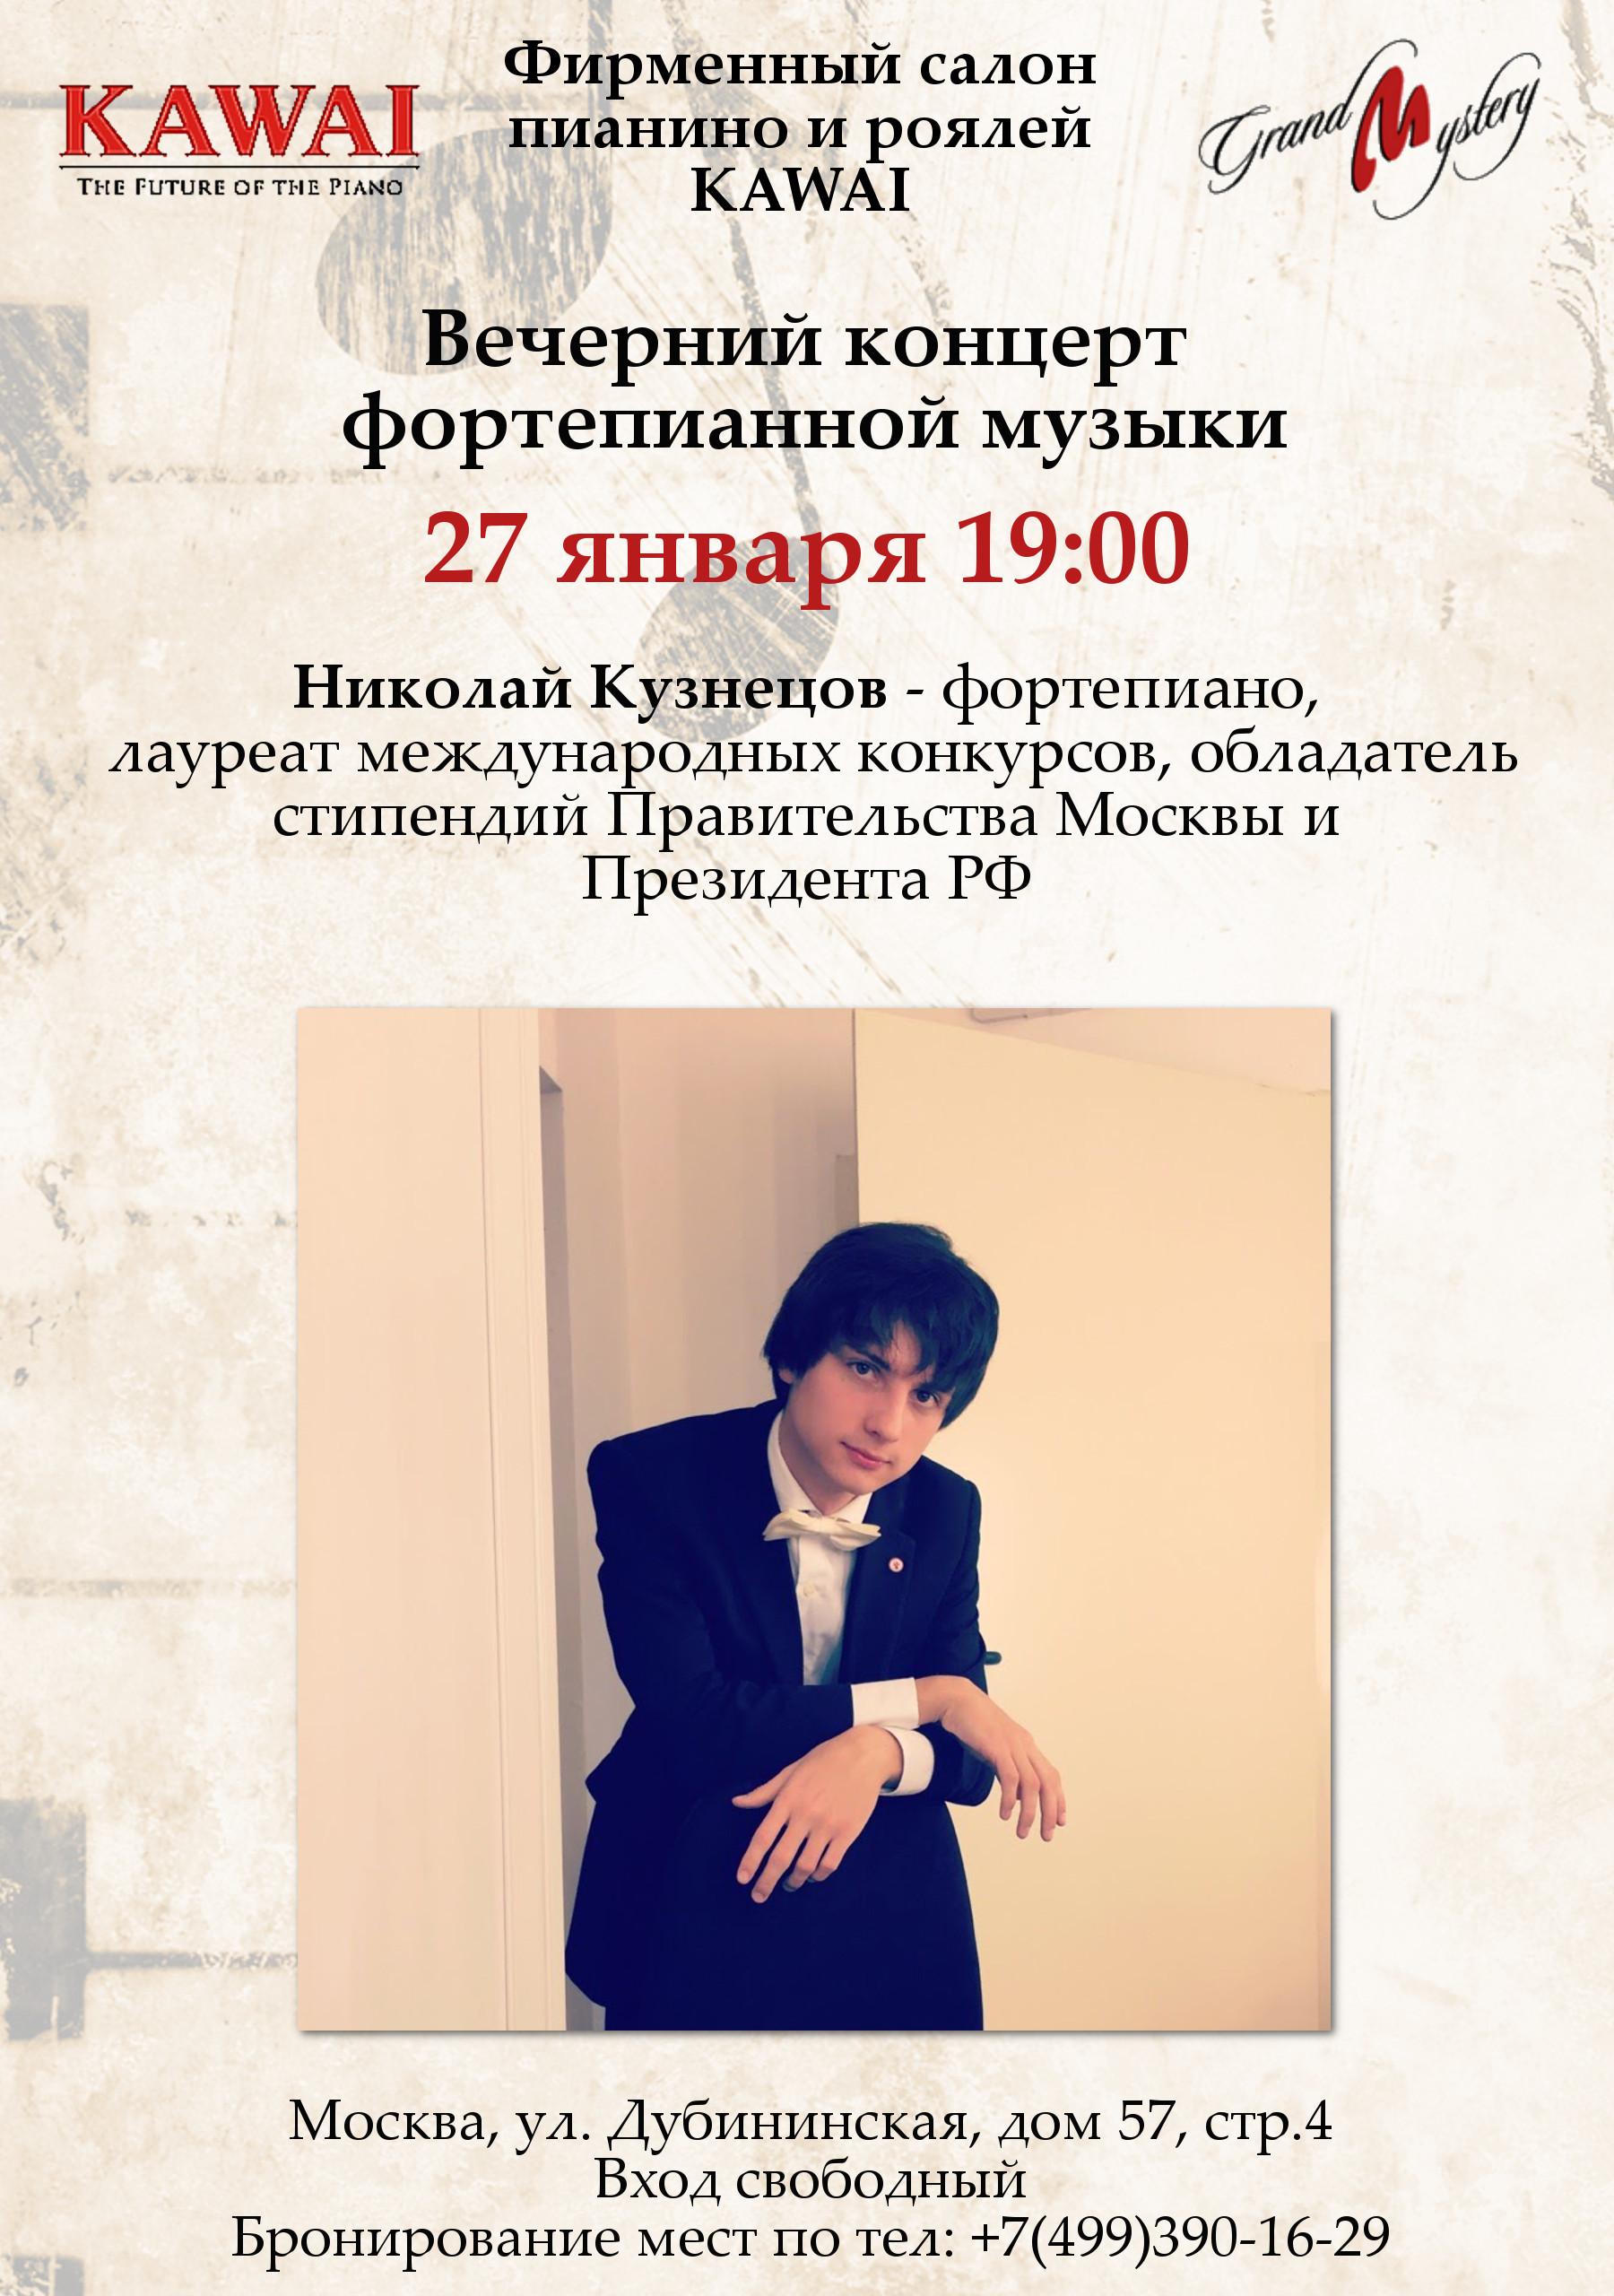 Концерт Николая Кузнецова